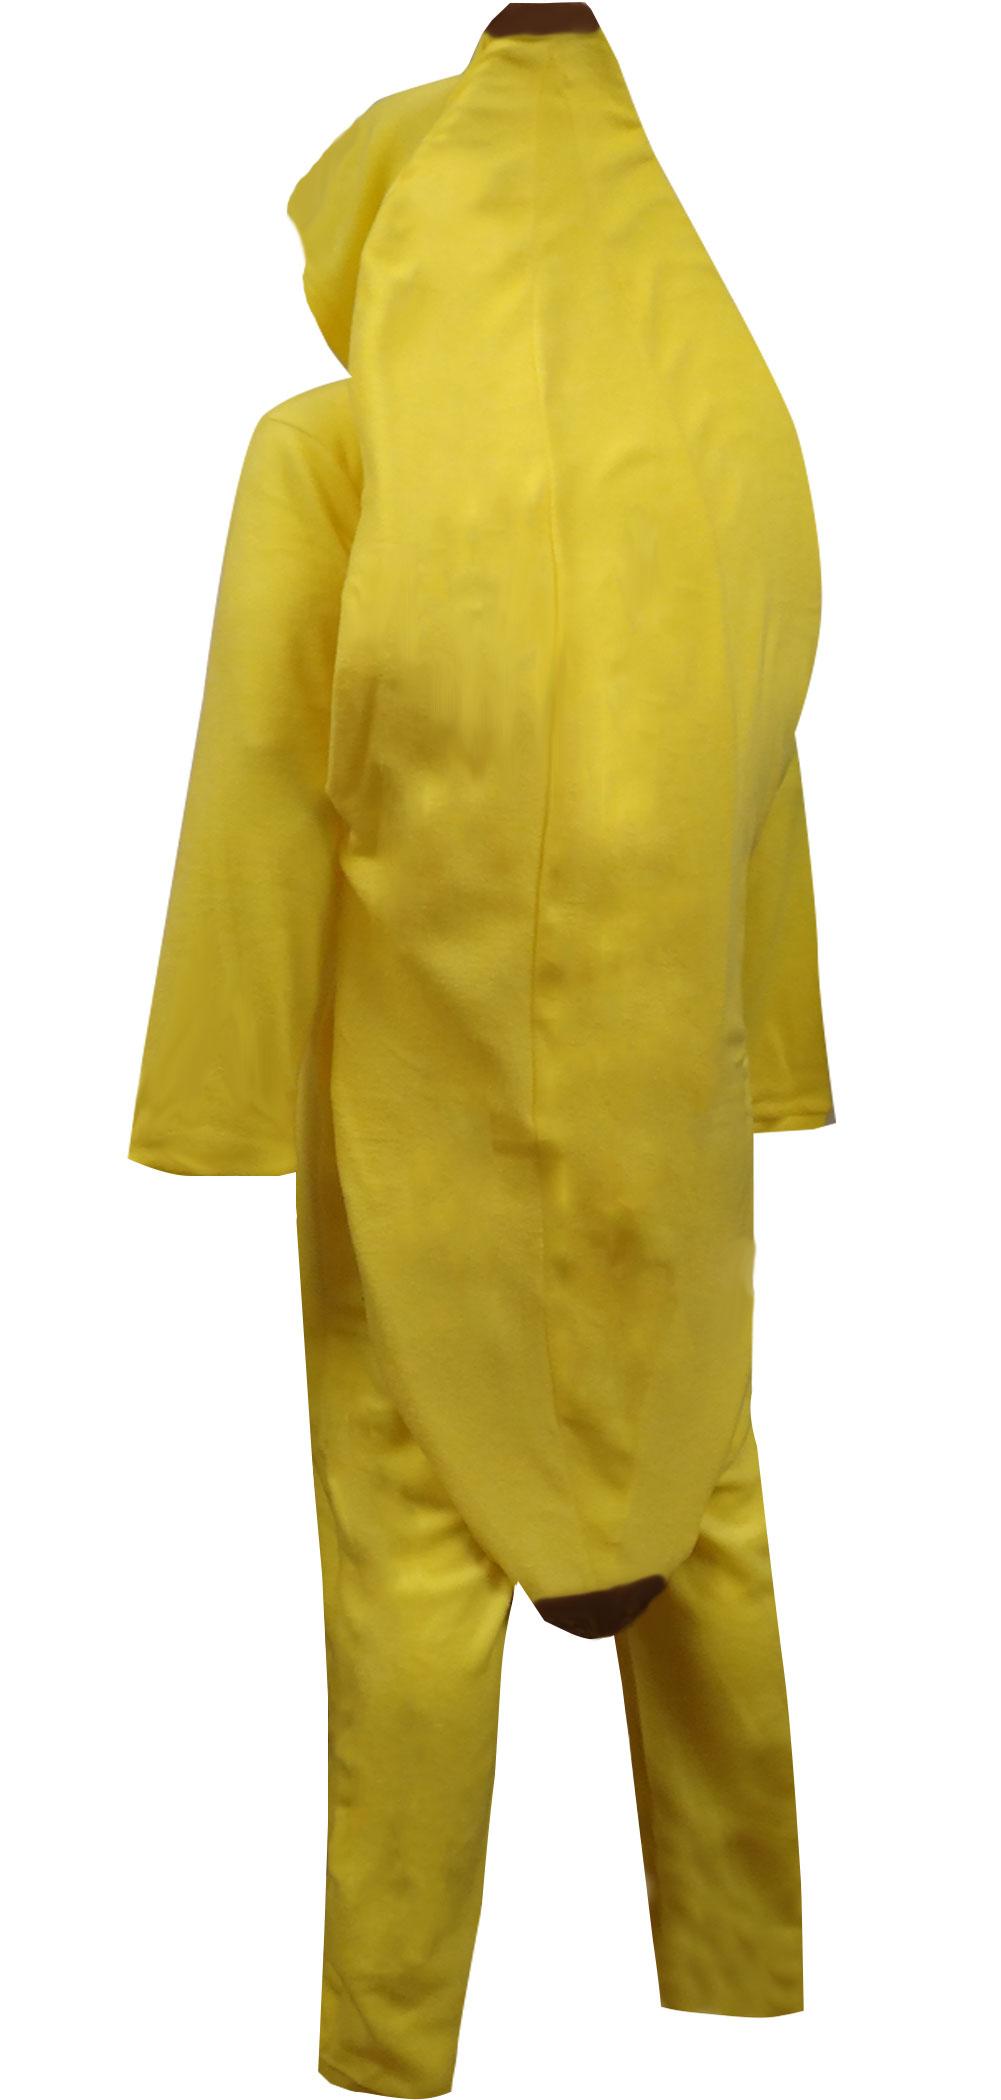 Image of Big Yellow Banana Hooded Onesie Pajama for men